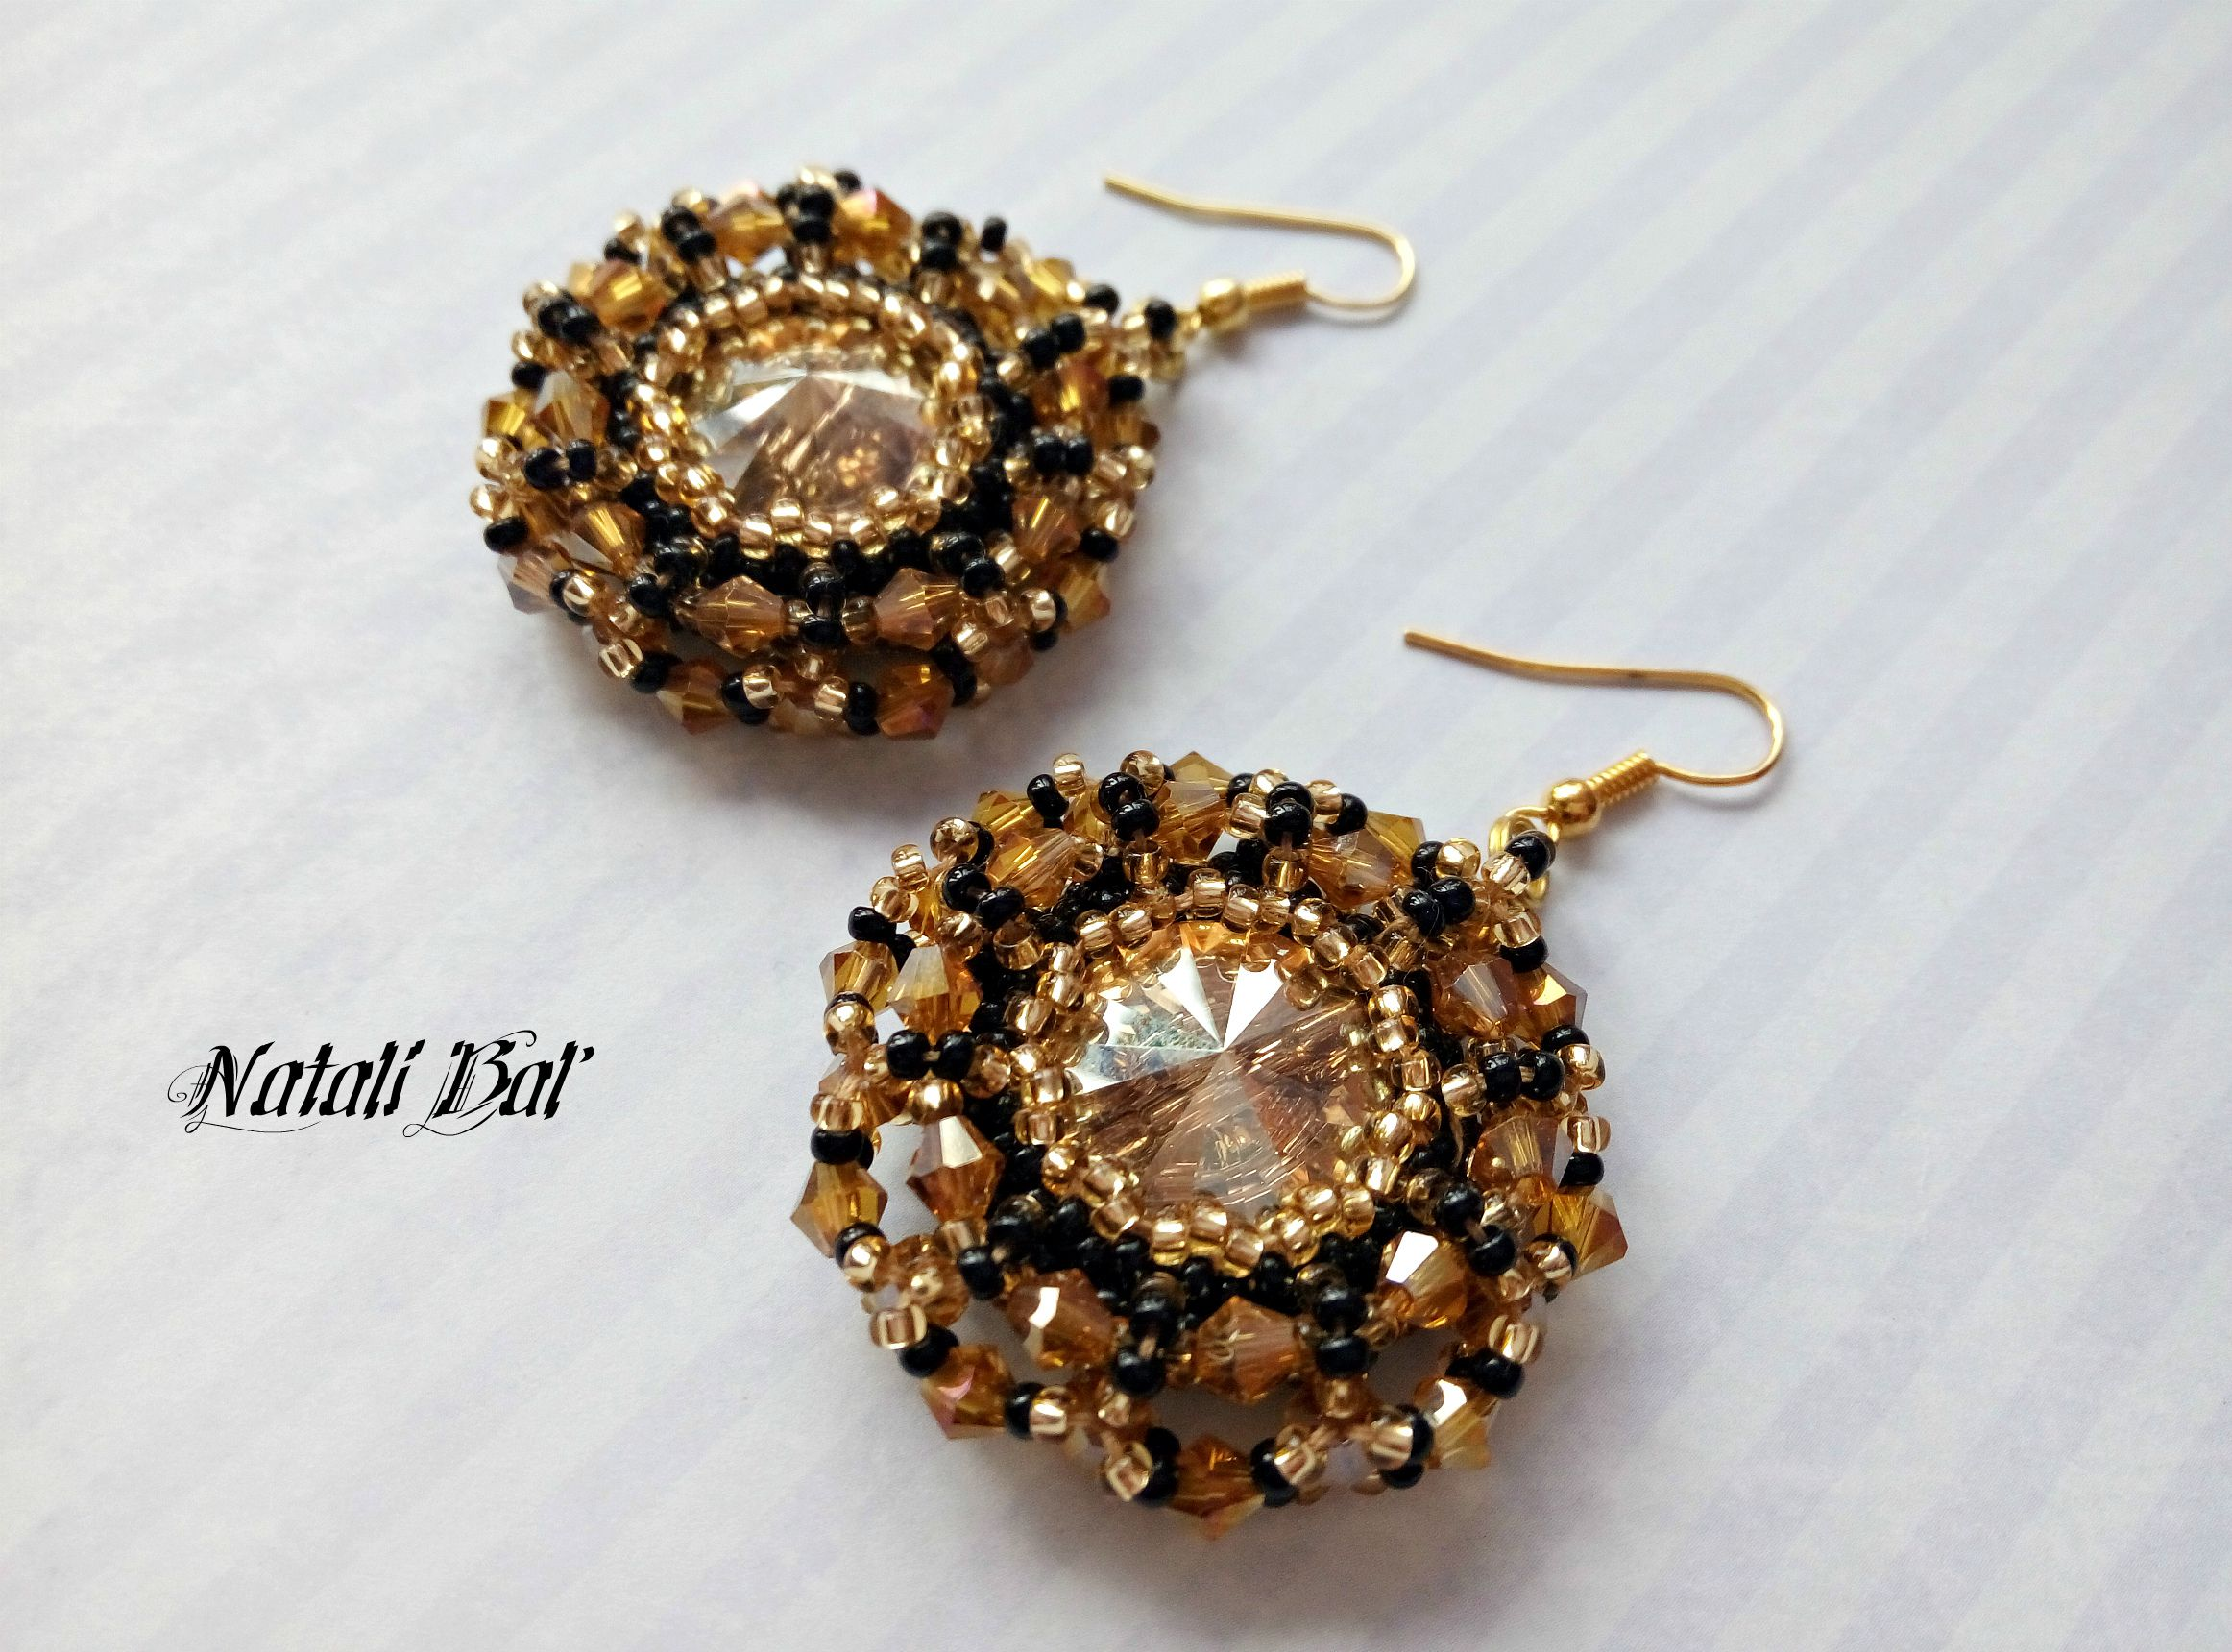 handmade серьги jewelry аксессуары fashion style бижутерия красотакоторуюможноносить swarovski стиль своимируками ручнаяработа мода